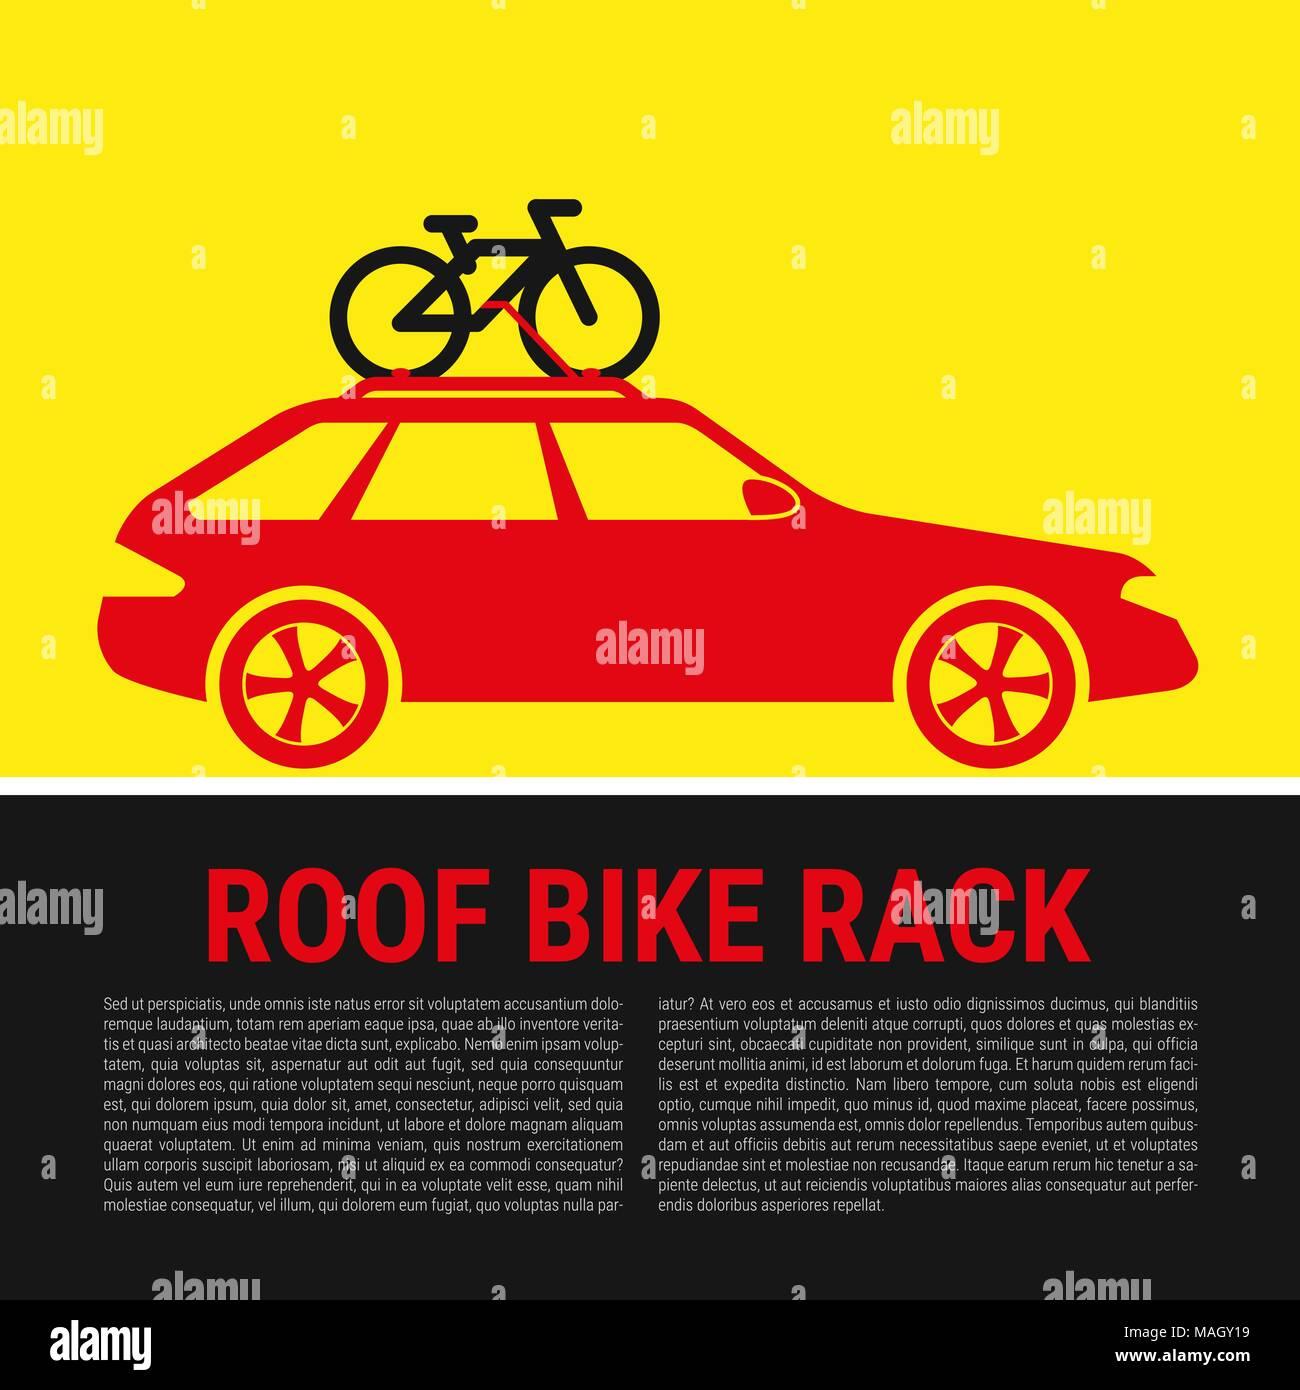 Roof Bike Rack. Bicycle Rack Silhouette Illustration - Stock Vector